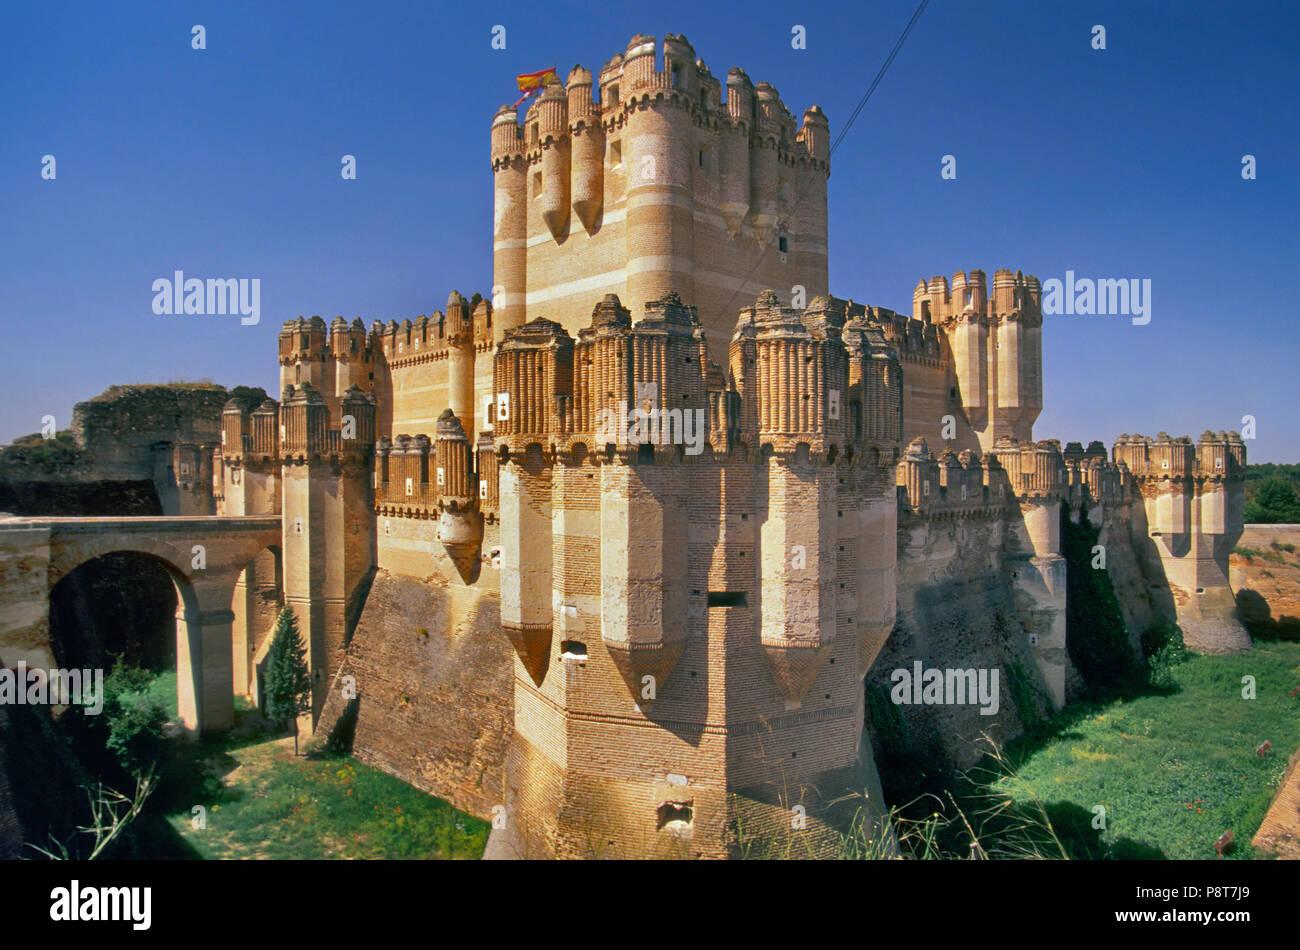 Coca Castle, Mudejar style, Coca, Castile-Leon, Spain - Stock Image